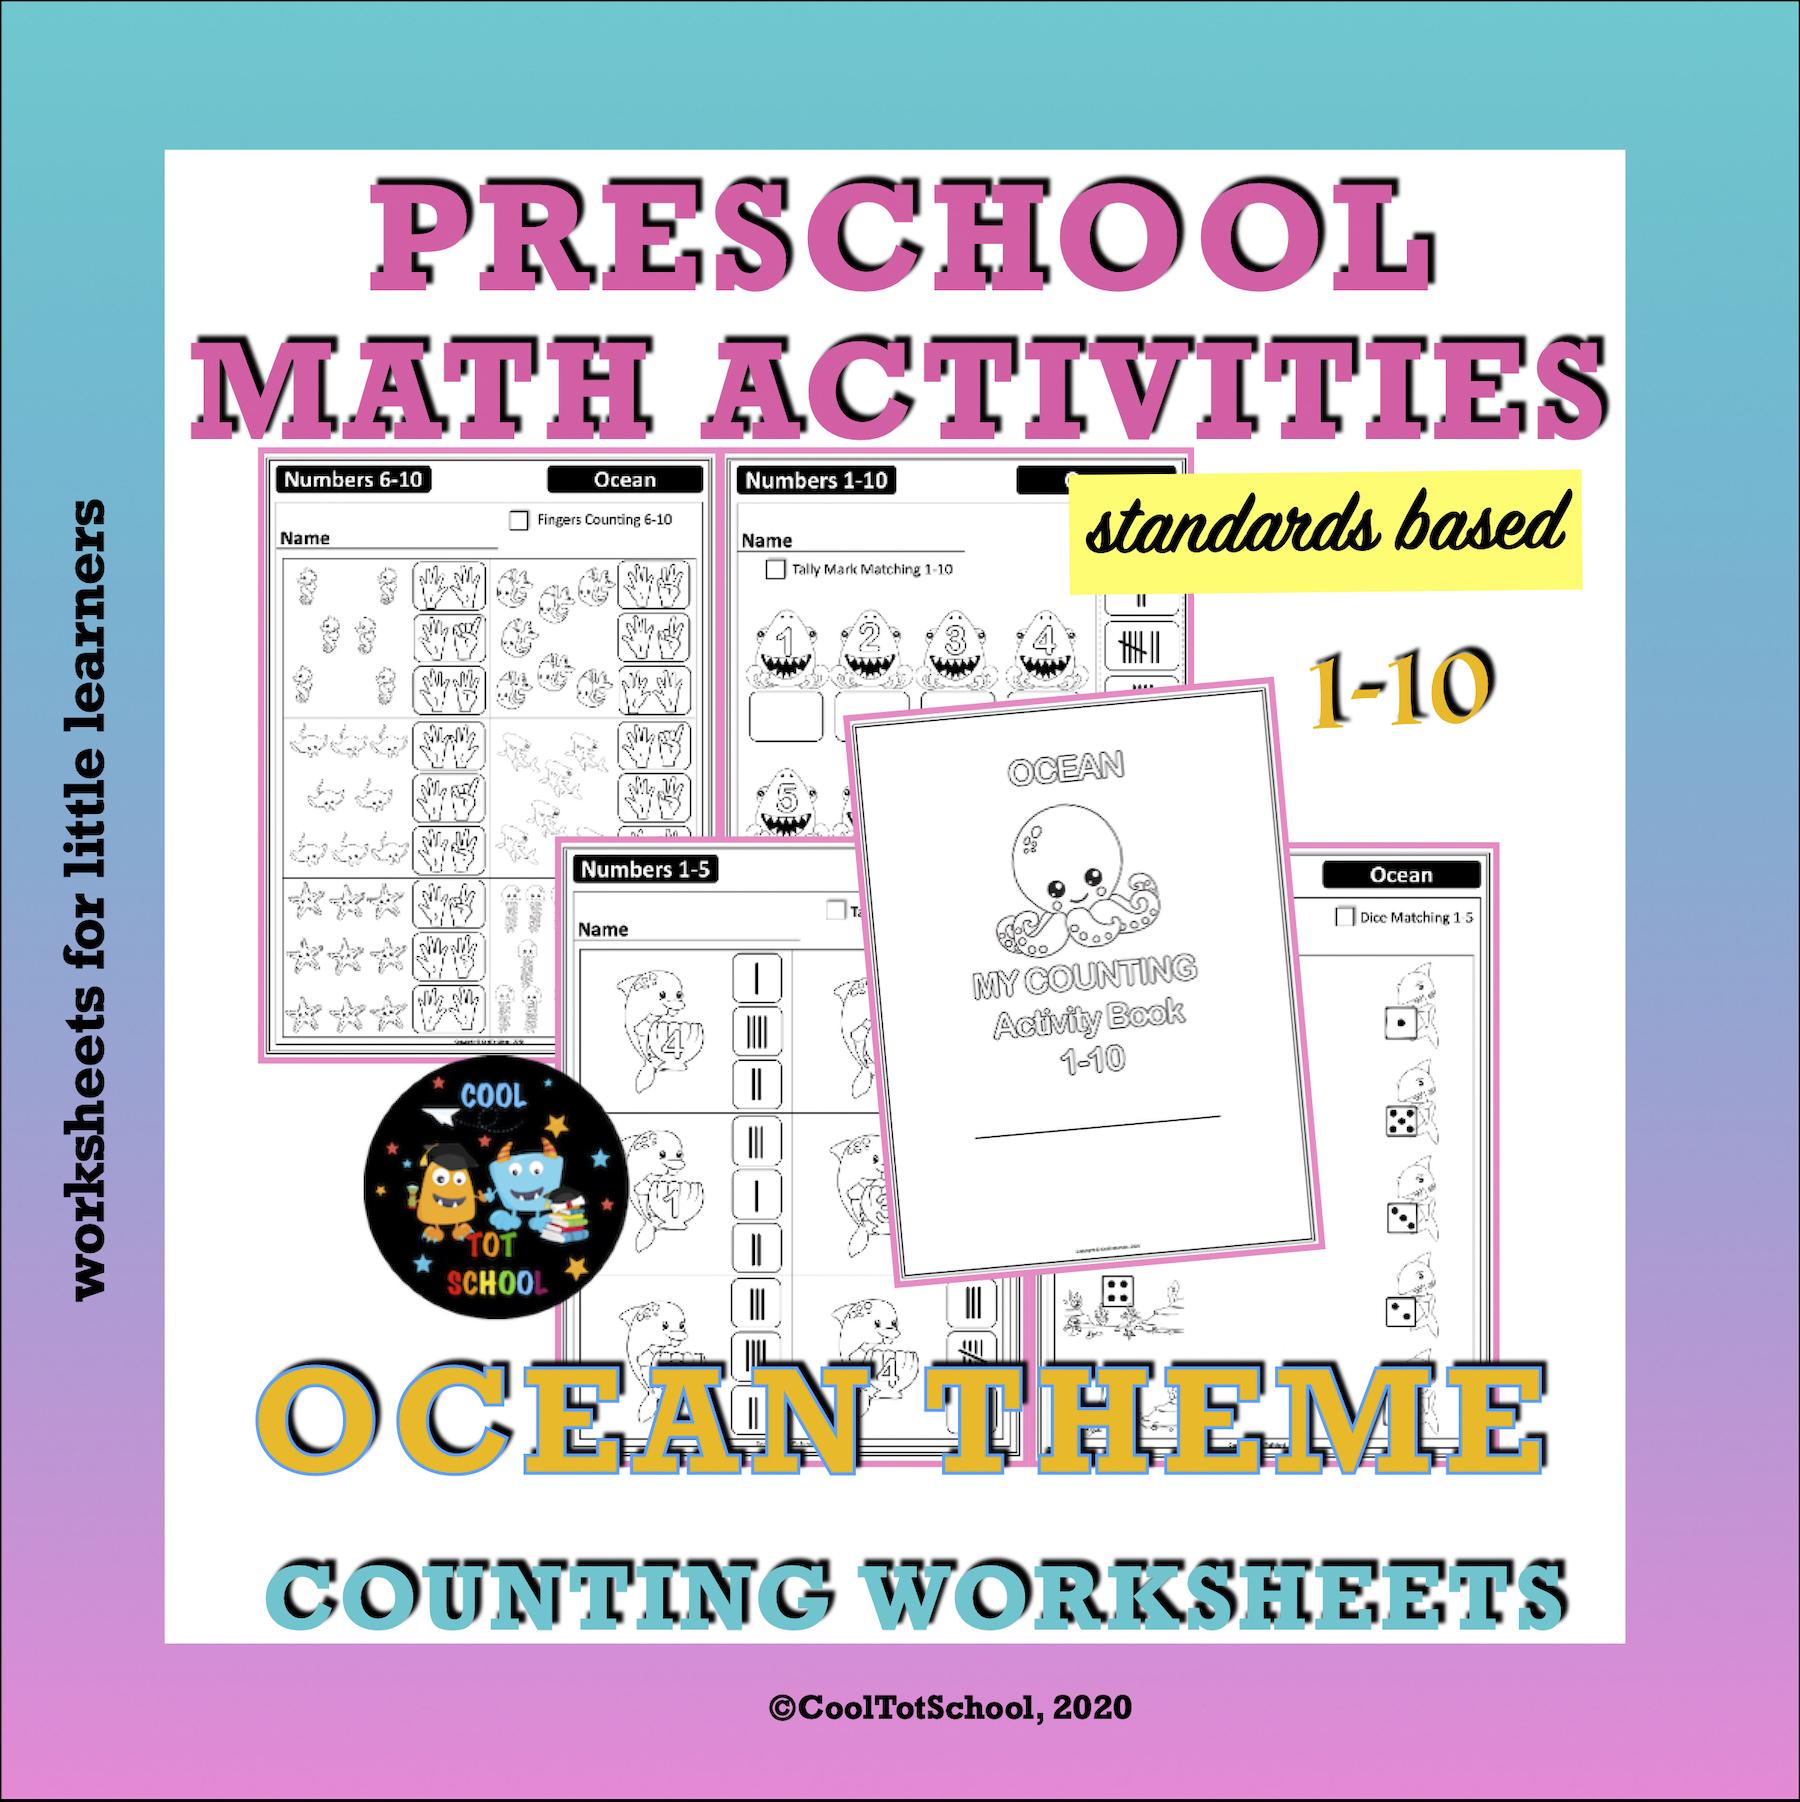 ocean-theme-preschool-worksheets-cover-image